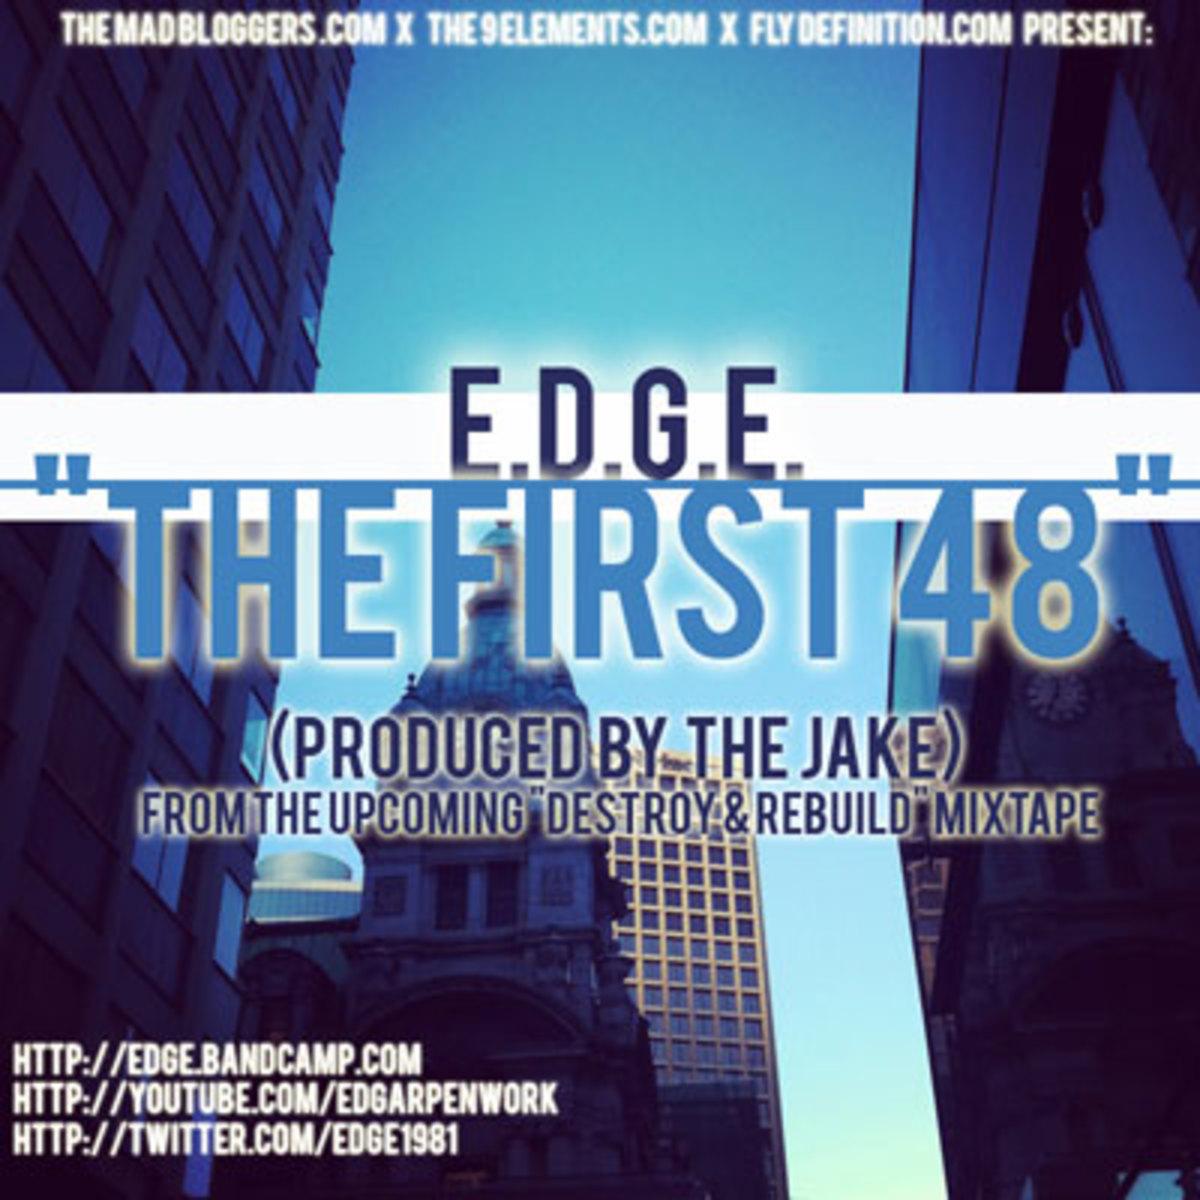 edge-thefirst48.jpg